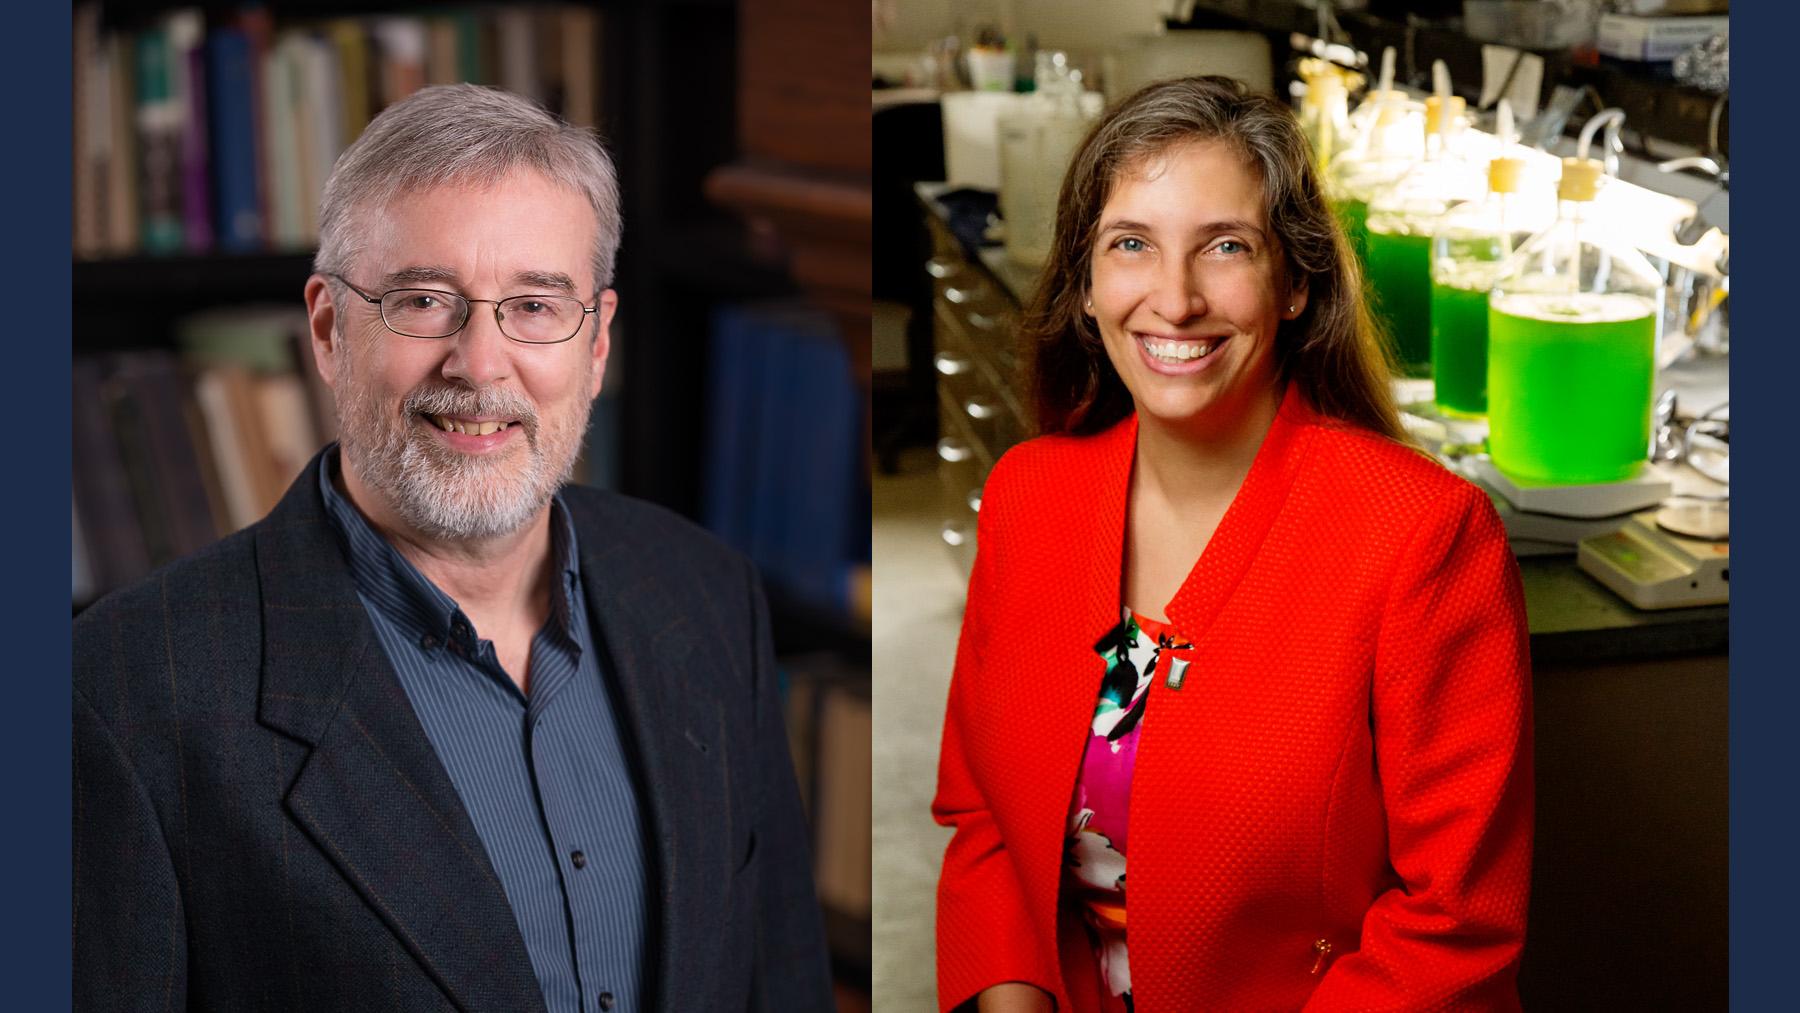 Statistics professor Douglas Simpson and animal biology professor Carla Caceres. Photos by L. Brian Stauffer